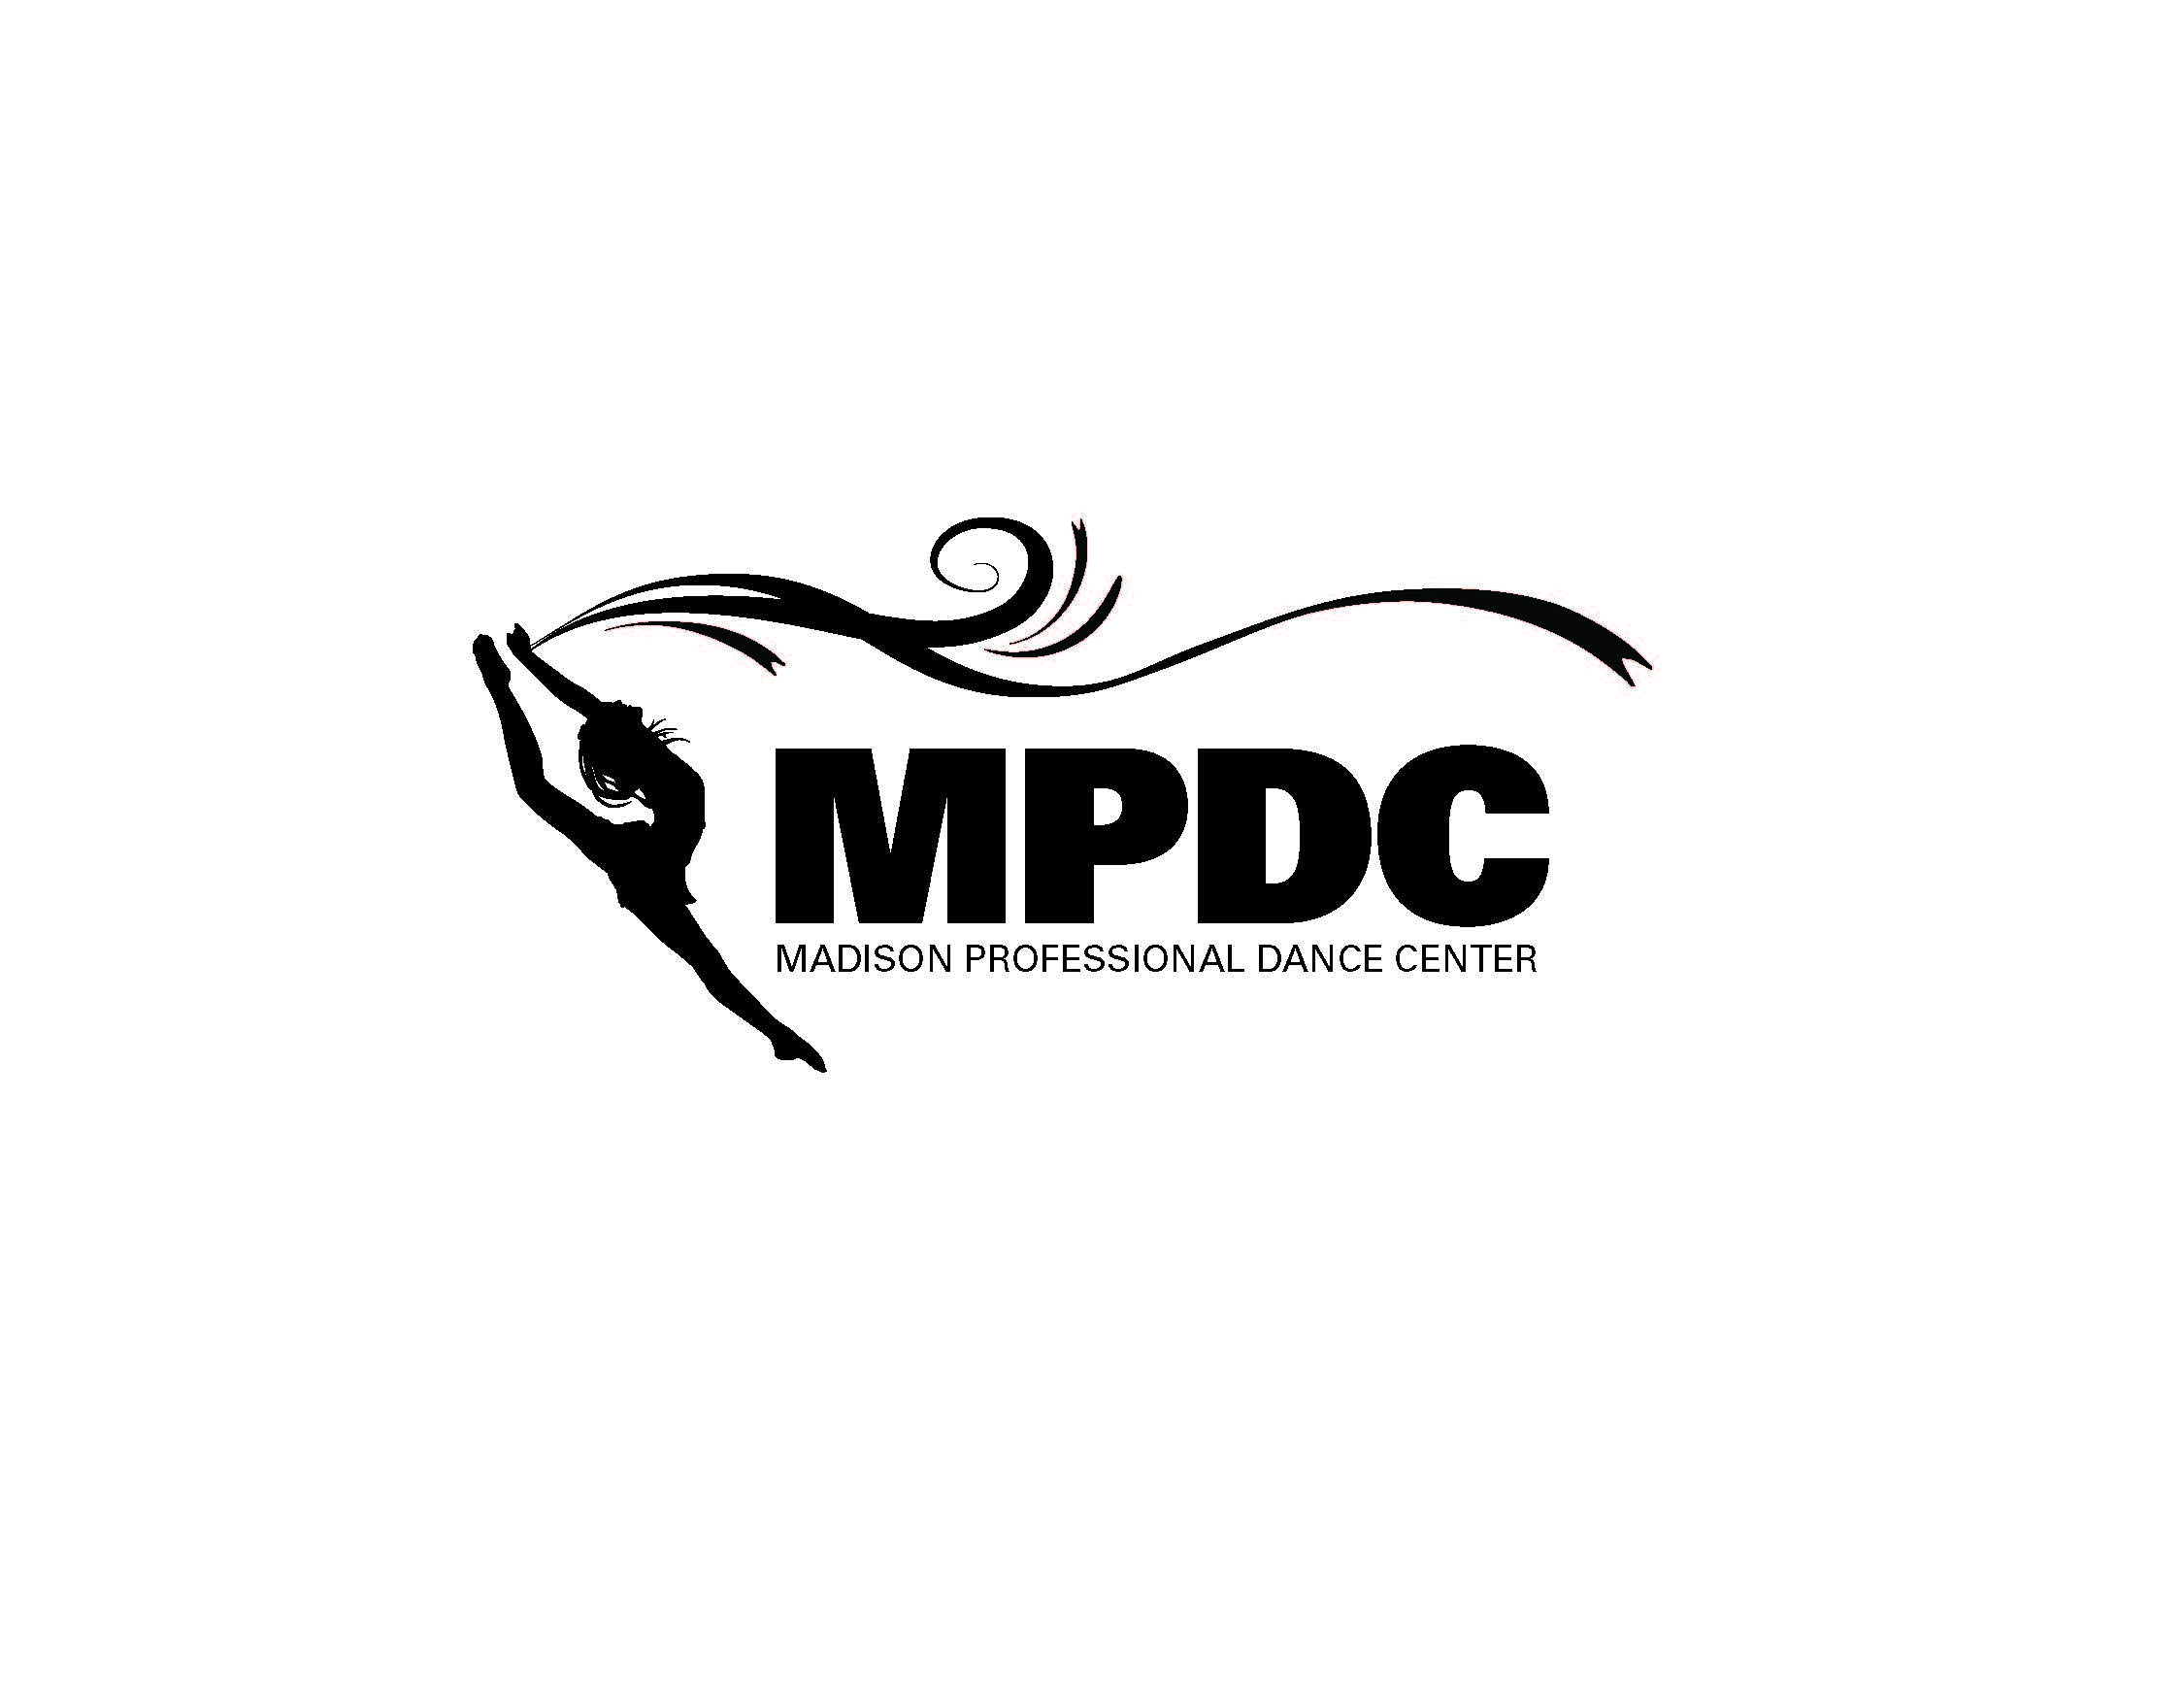 Madison Professional Dance Center